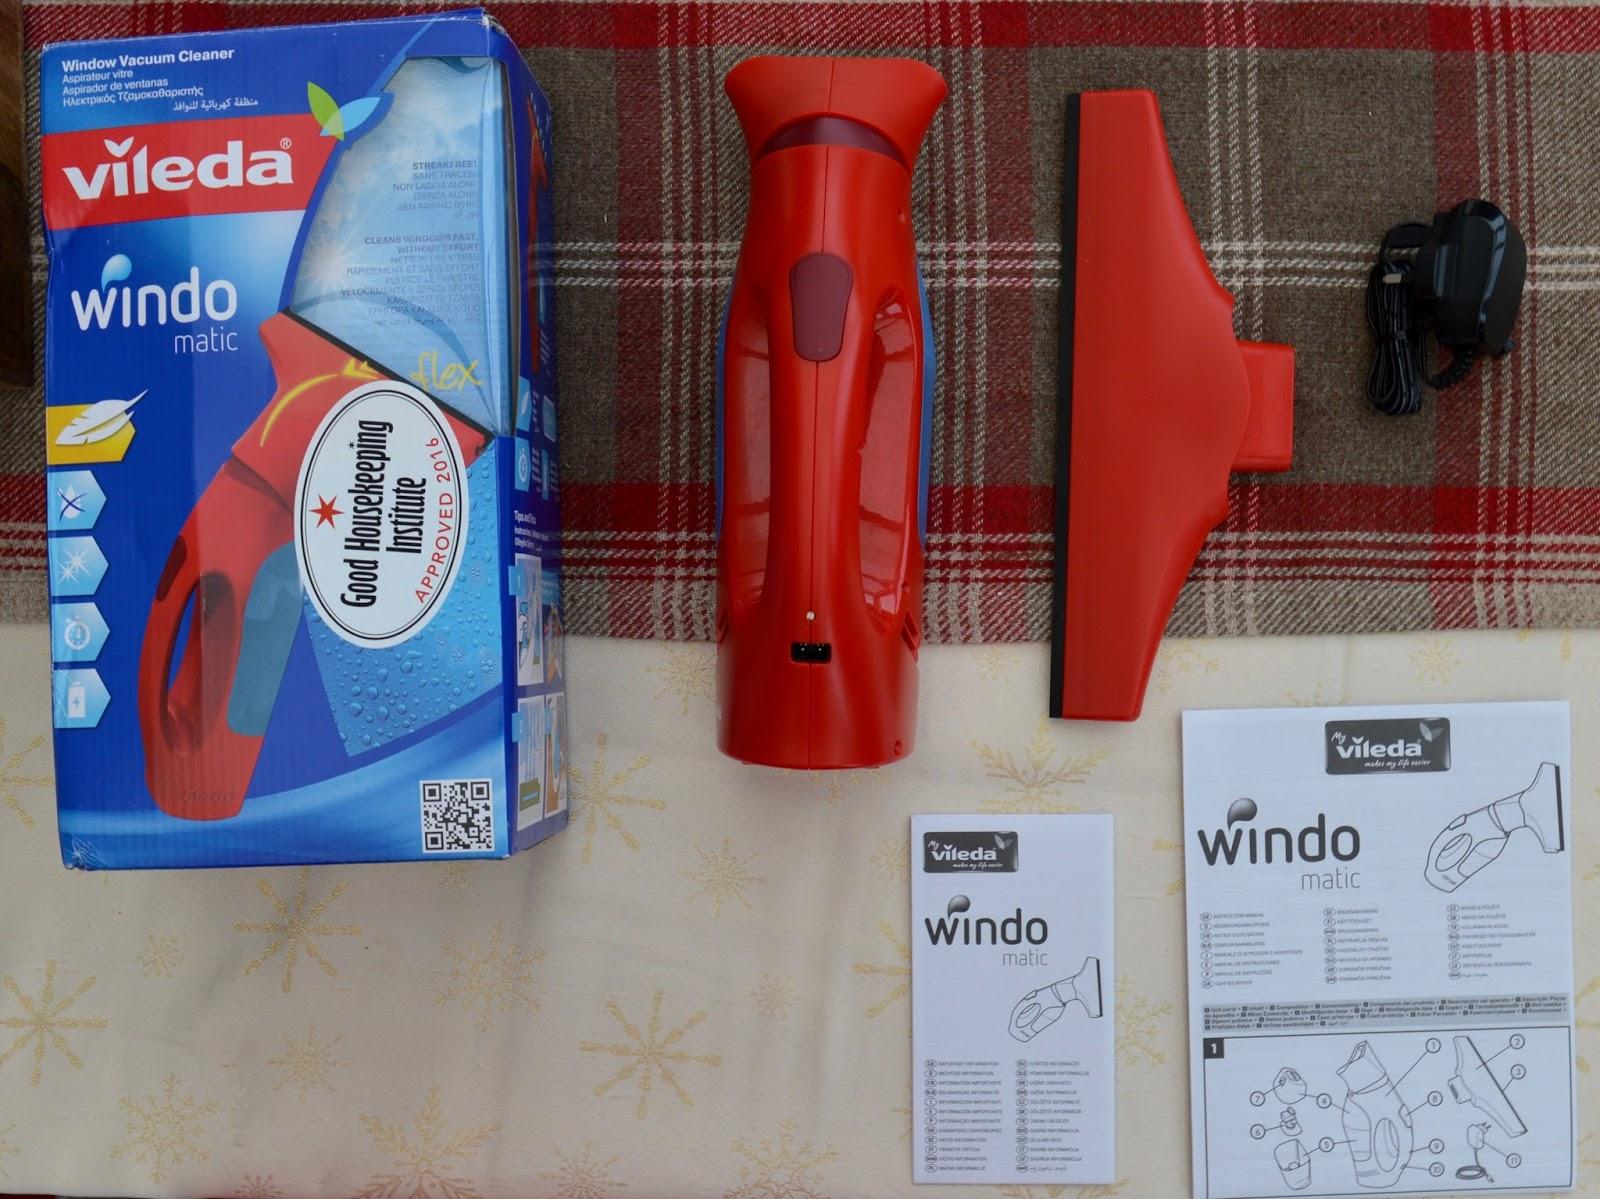 Vileda Windomatic Window Vacuum Review | How to achieve streak free windows - what's in the box